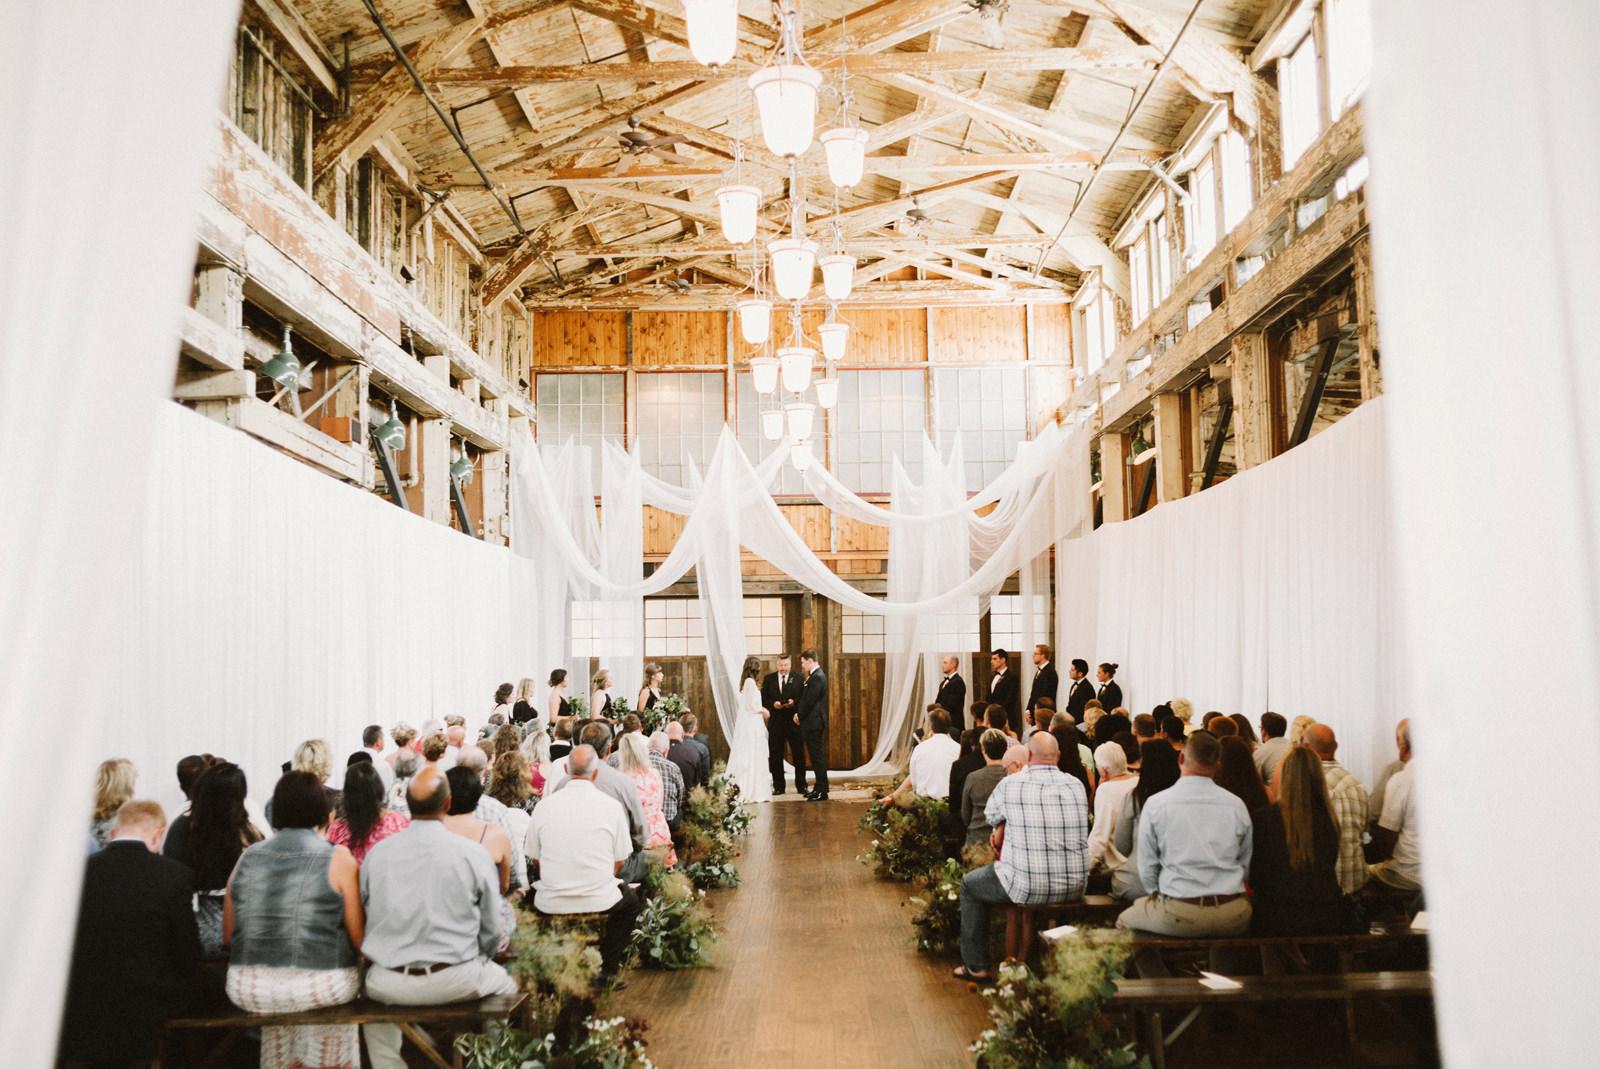 sodo-park-wedding-040 SODO PARK WEDDING